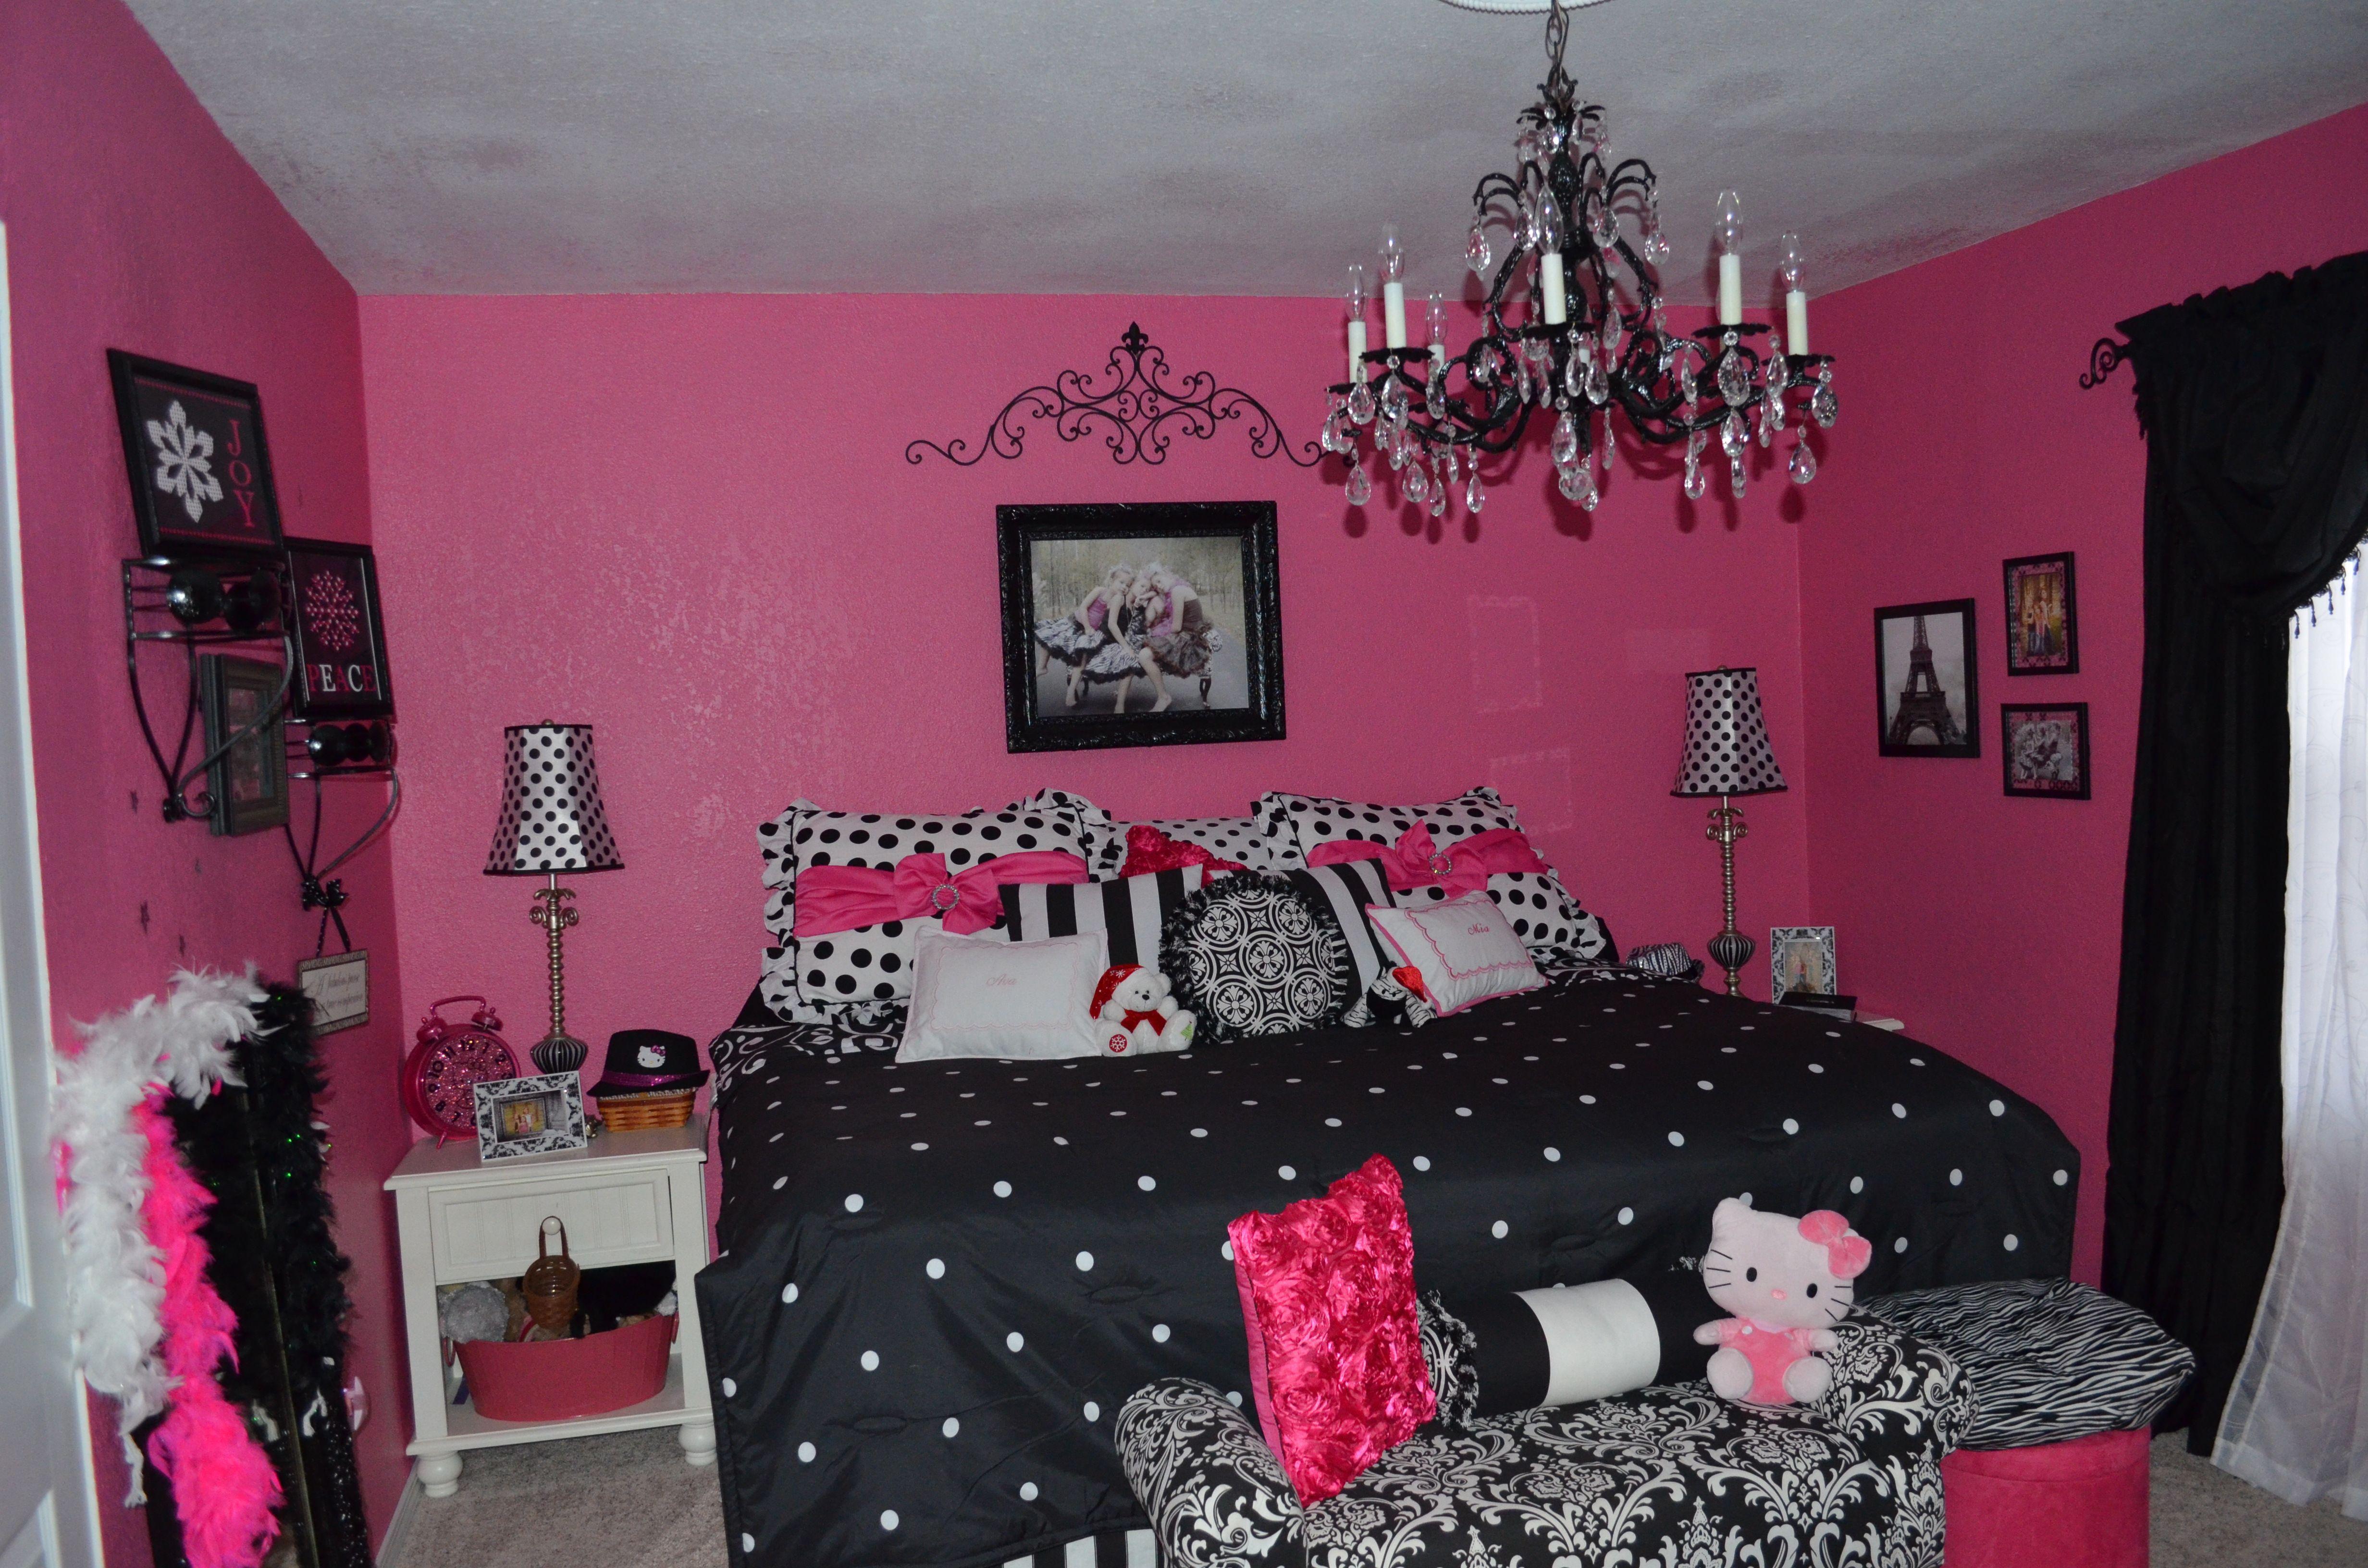 Hot Pink Black And White Girls Room Girls Room Ideas Girlie Room